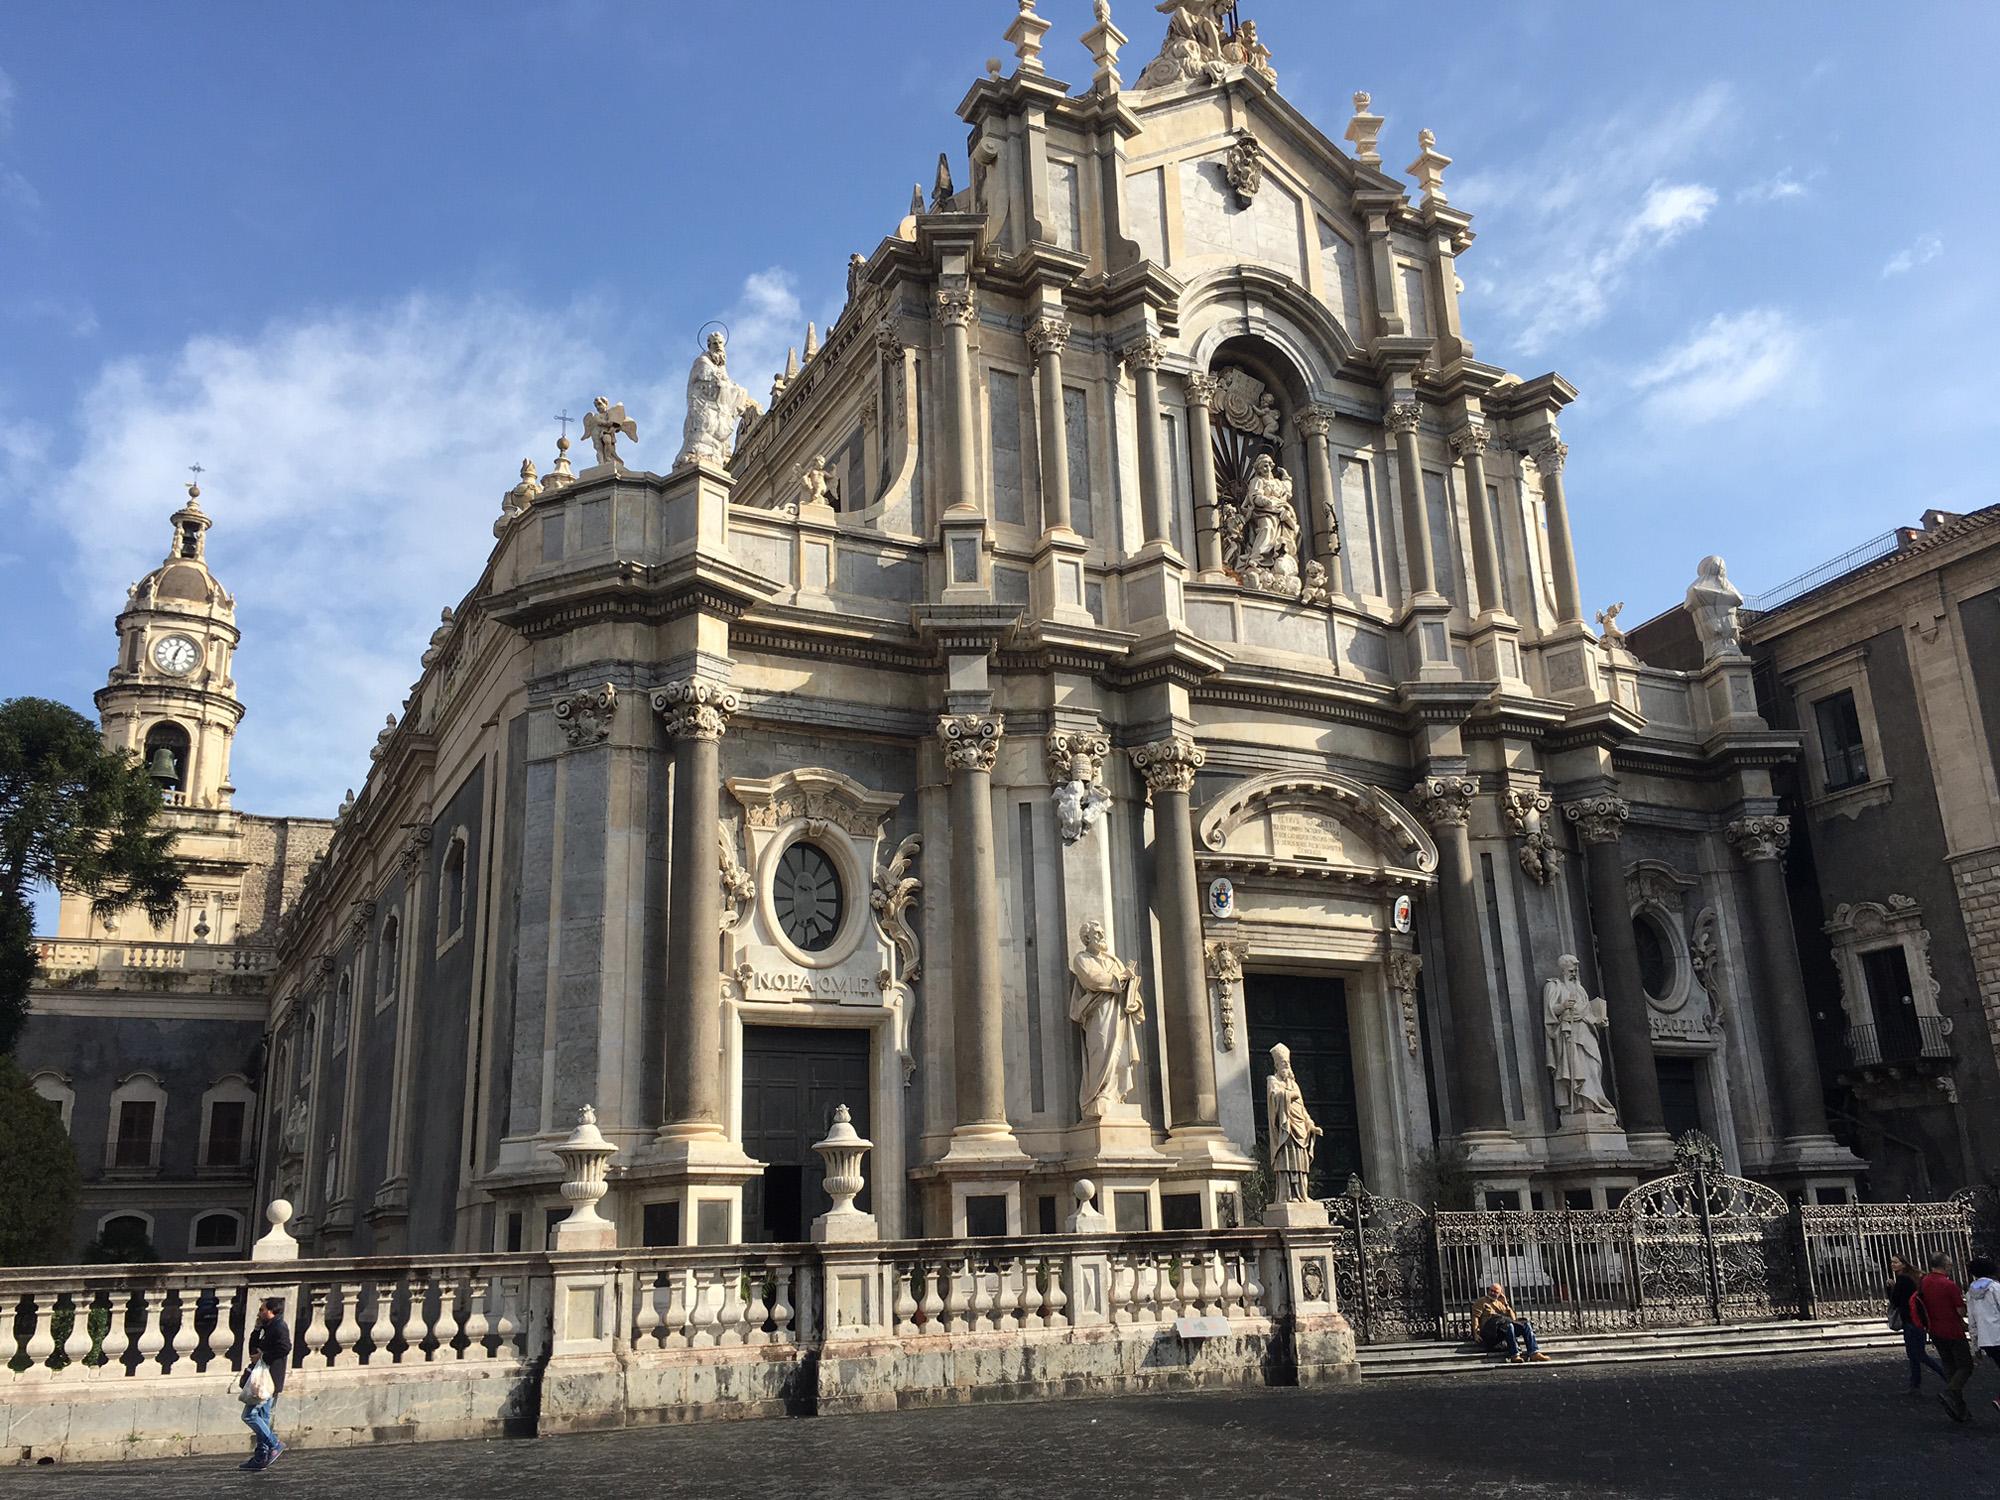 Catania Duomo Square